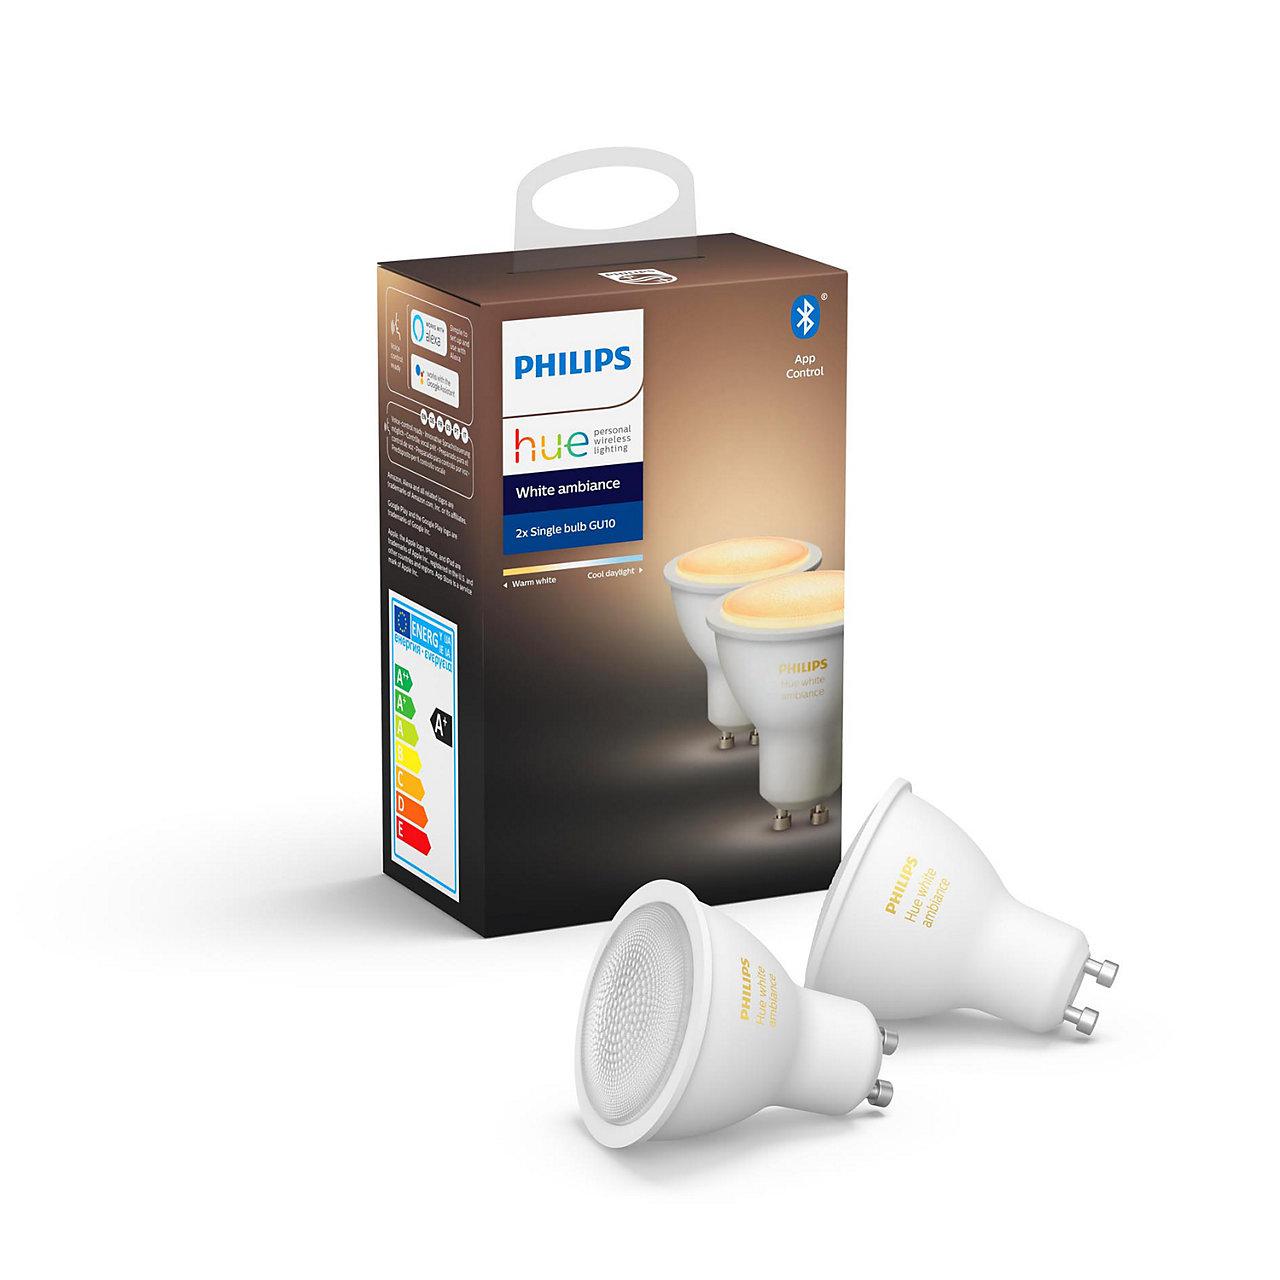 Philips Hue White Ambiance - GU10 Duopack